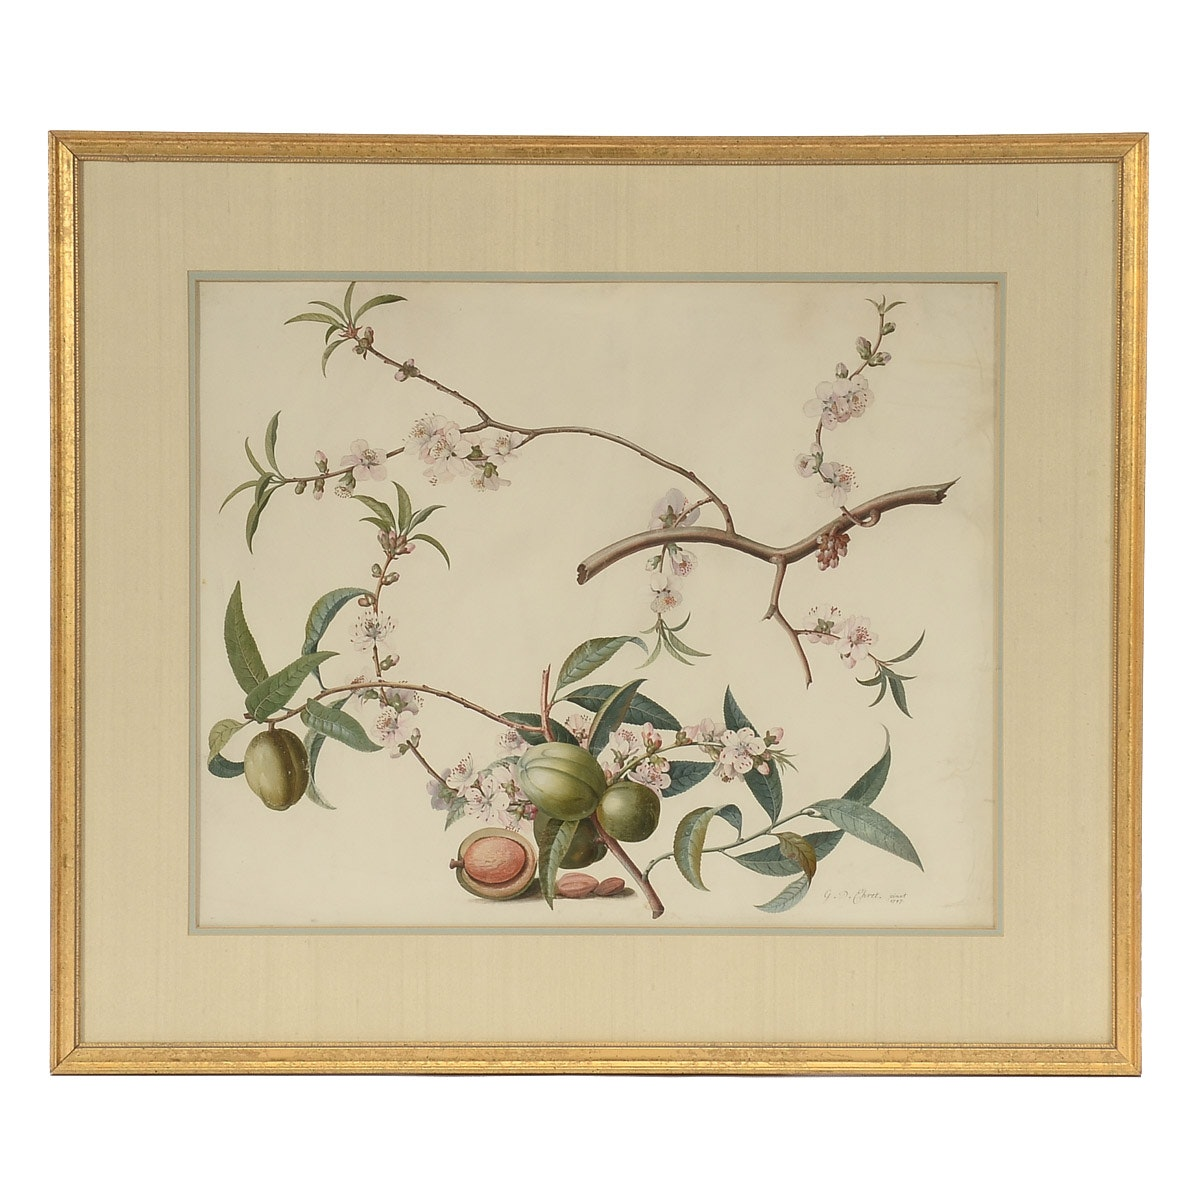 Georg Dionysius Ehret Gouache Botanical Illustration on Vellum